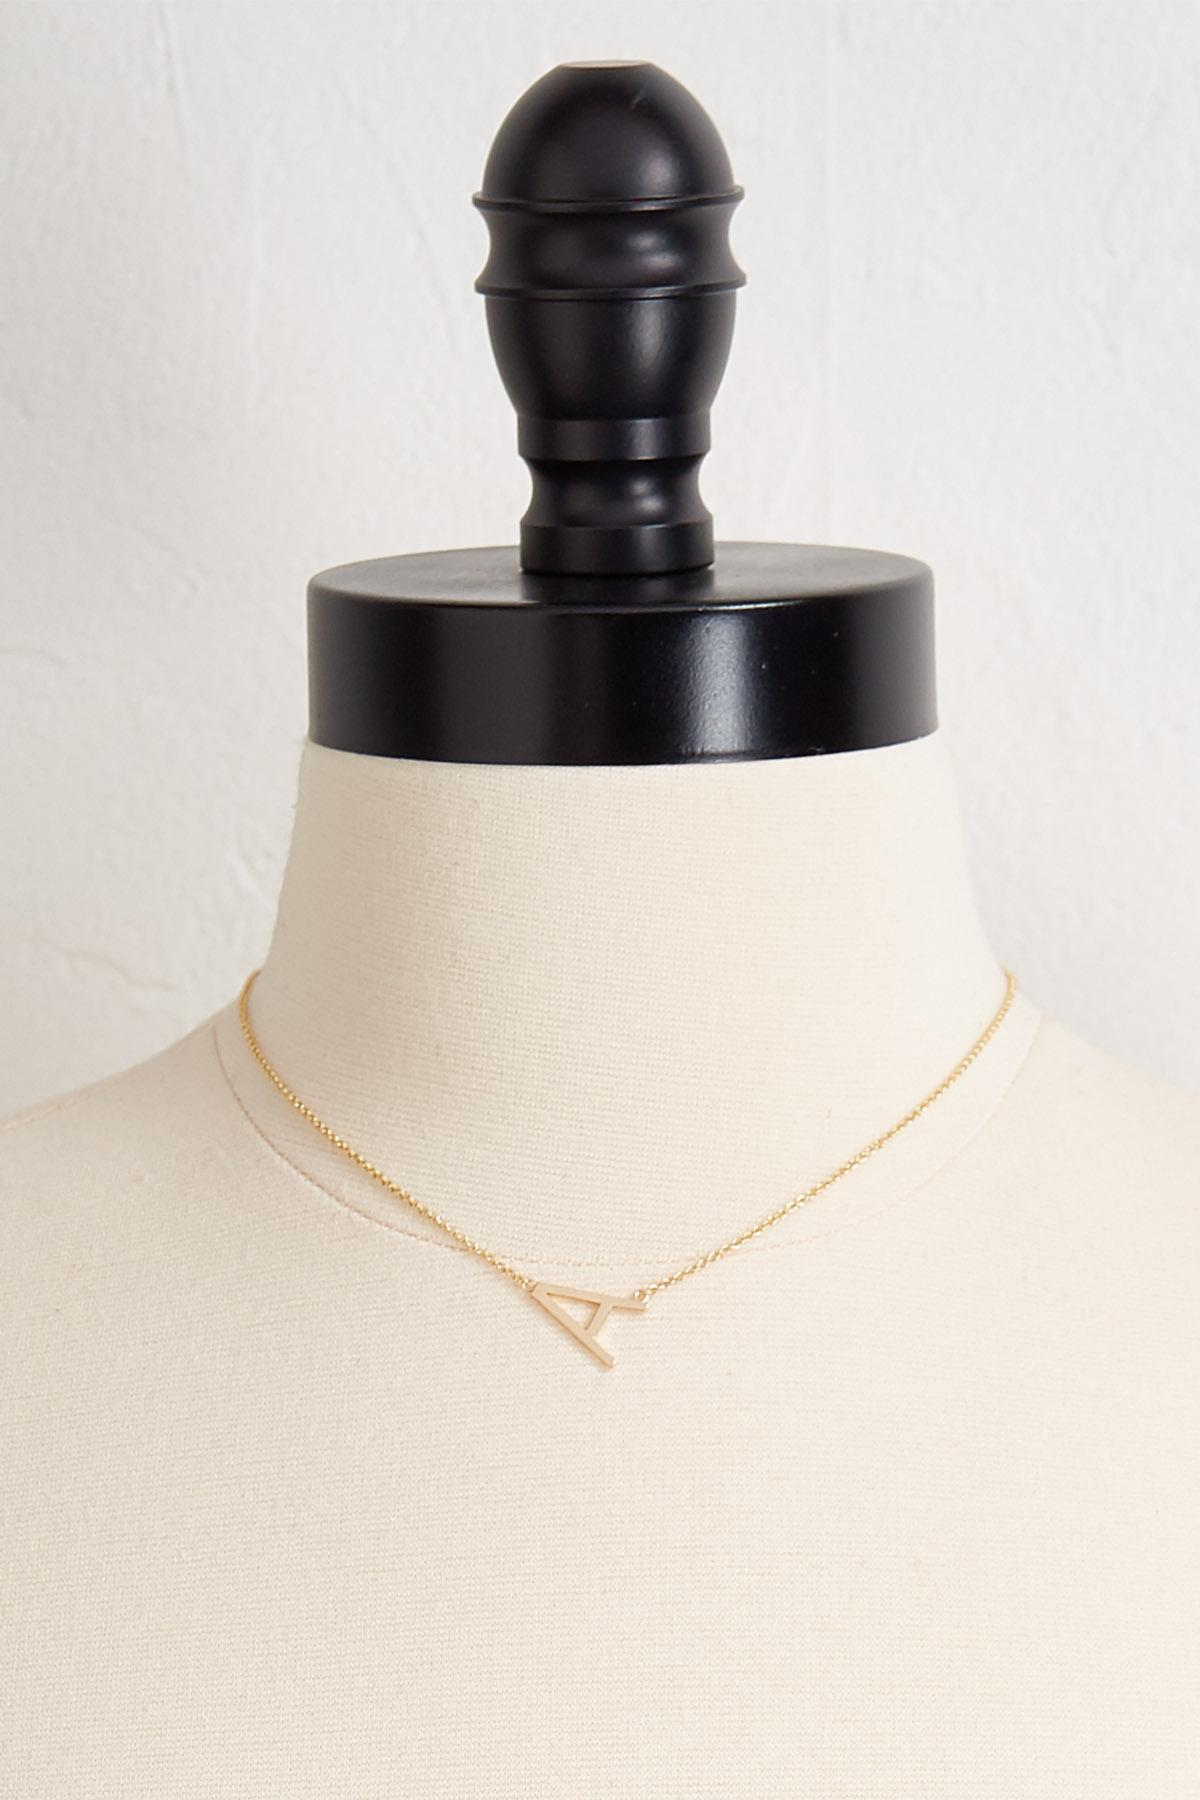 A Initial Pendant Necklace